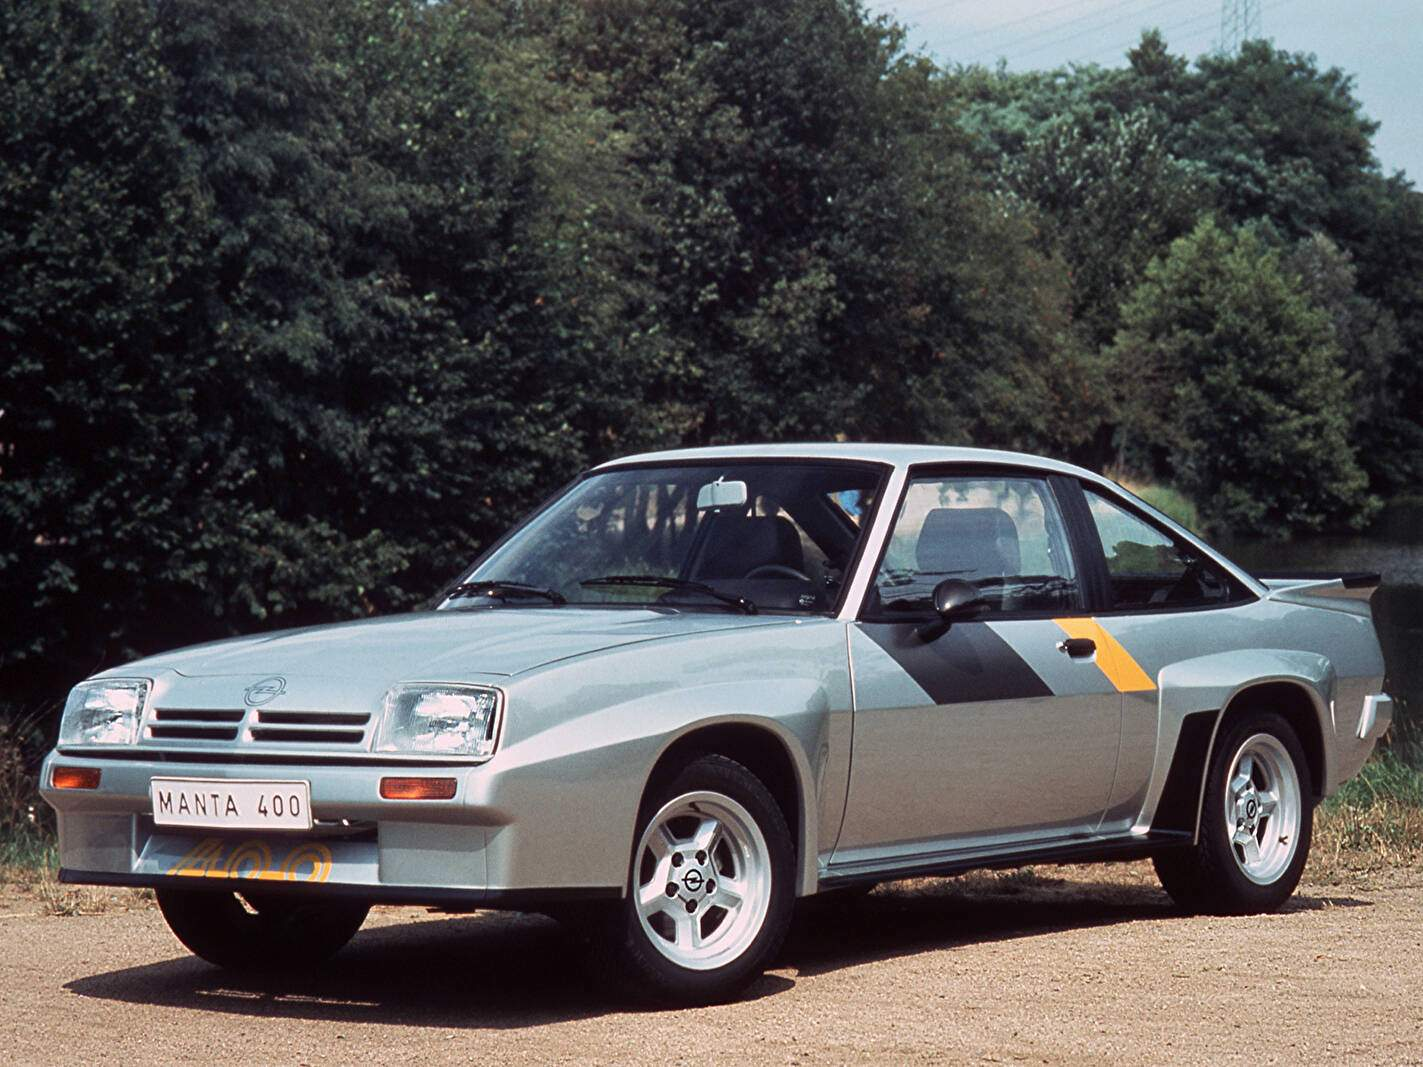 Opel Manta II 400 (1981-1984),  ajouté par fox58